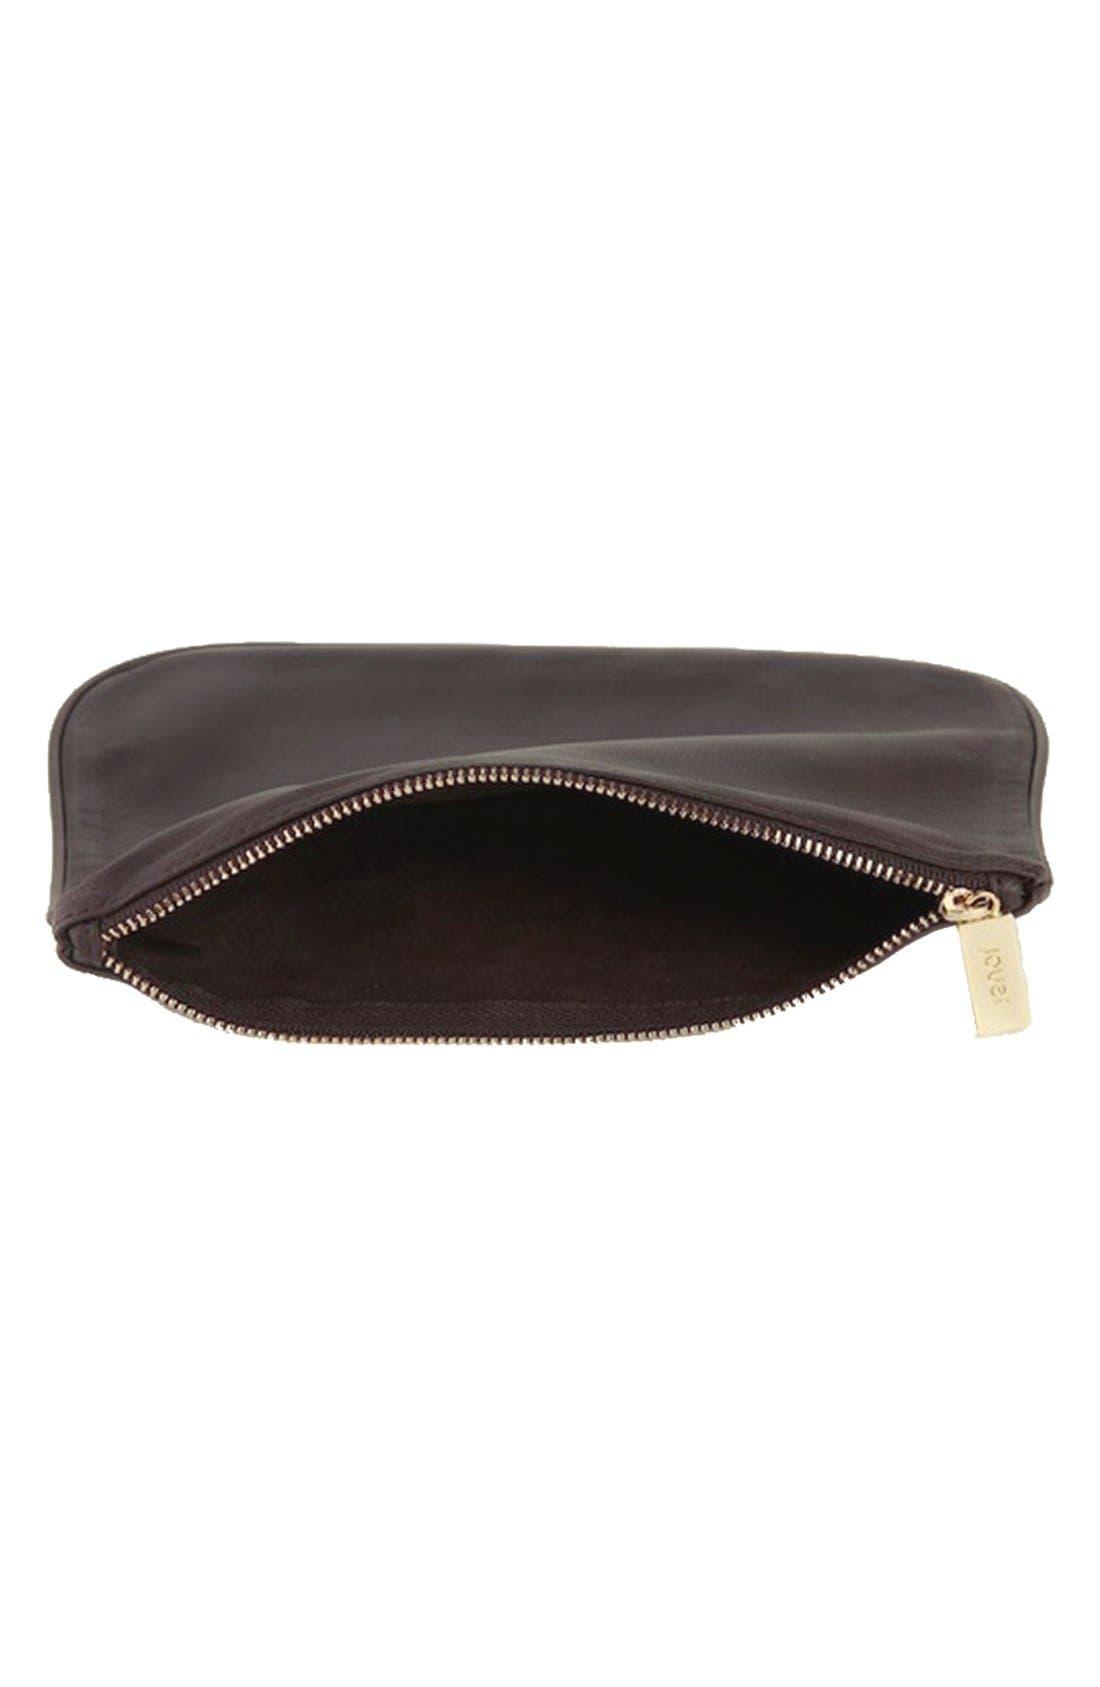 'IT - Chocolate' Cosmetics Bag,                             Alternate thumbnail 2, color,                             200